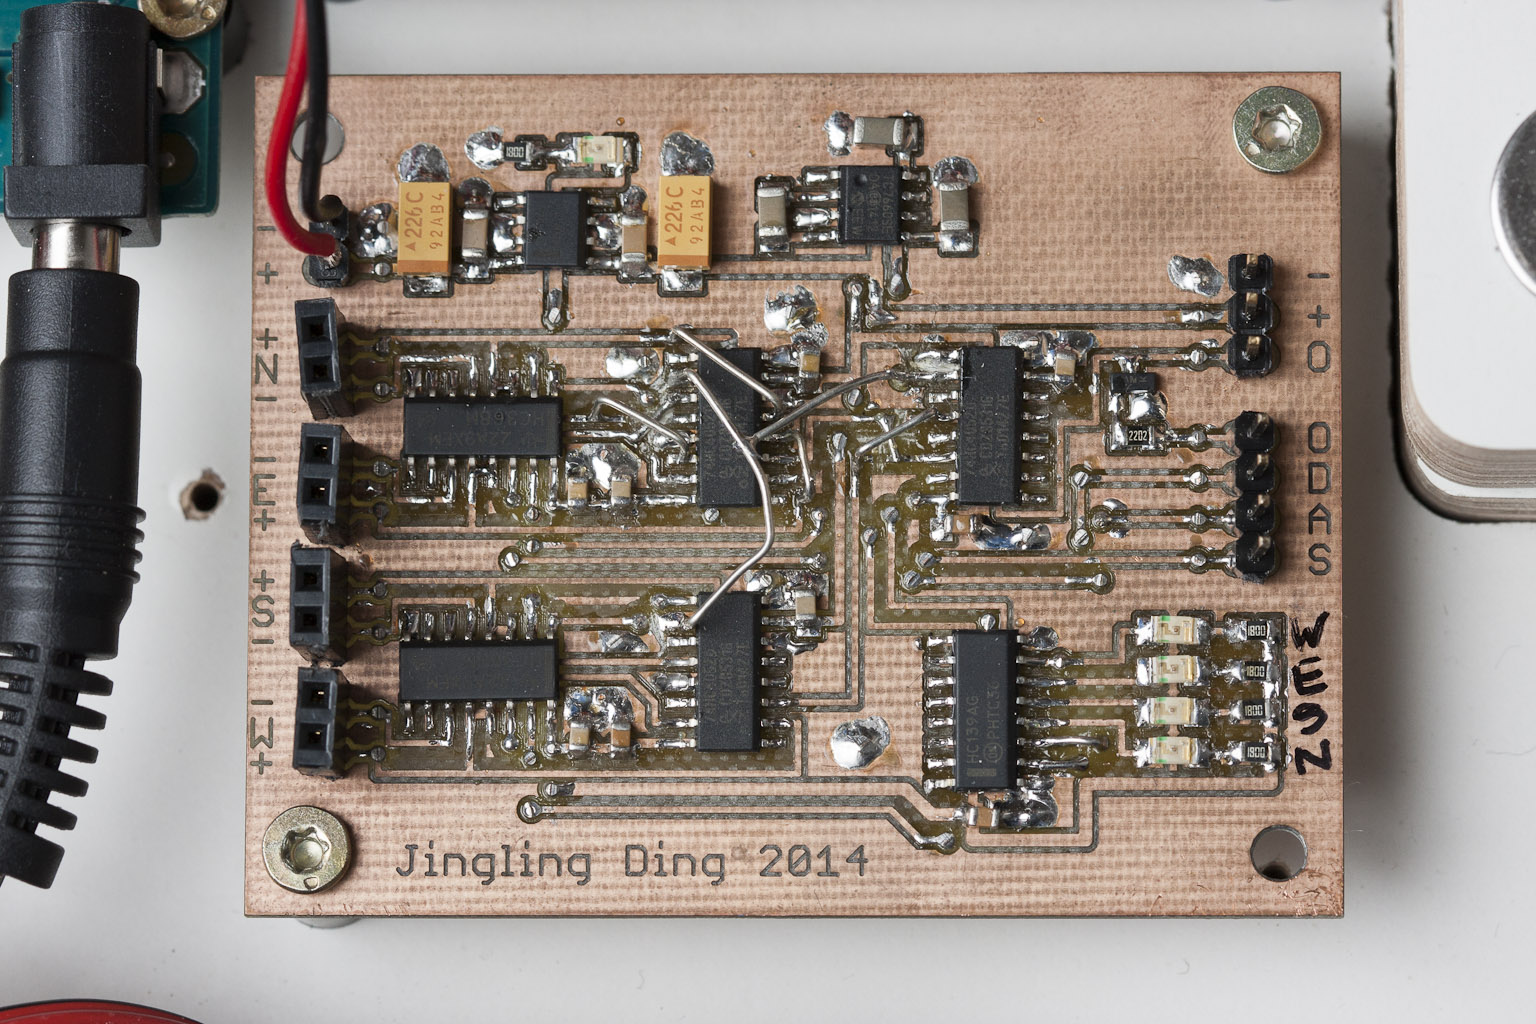 mg_1021 arduino ultrasonic anemometer part 2 digital circuit soldernerd Anemometer Arduino Feet per Minute at cos-gaming.co